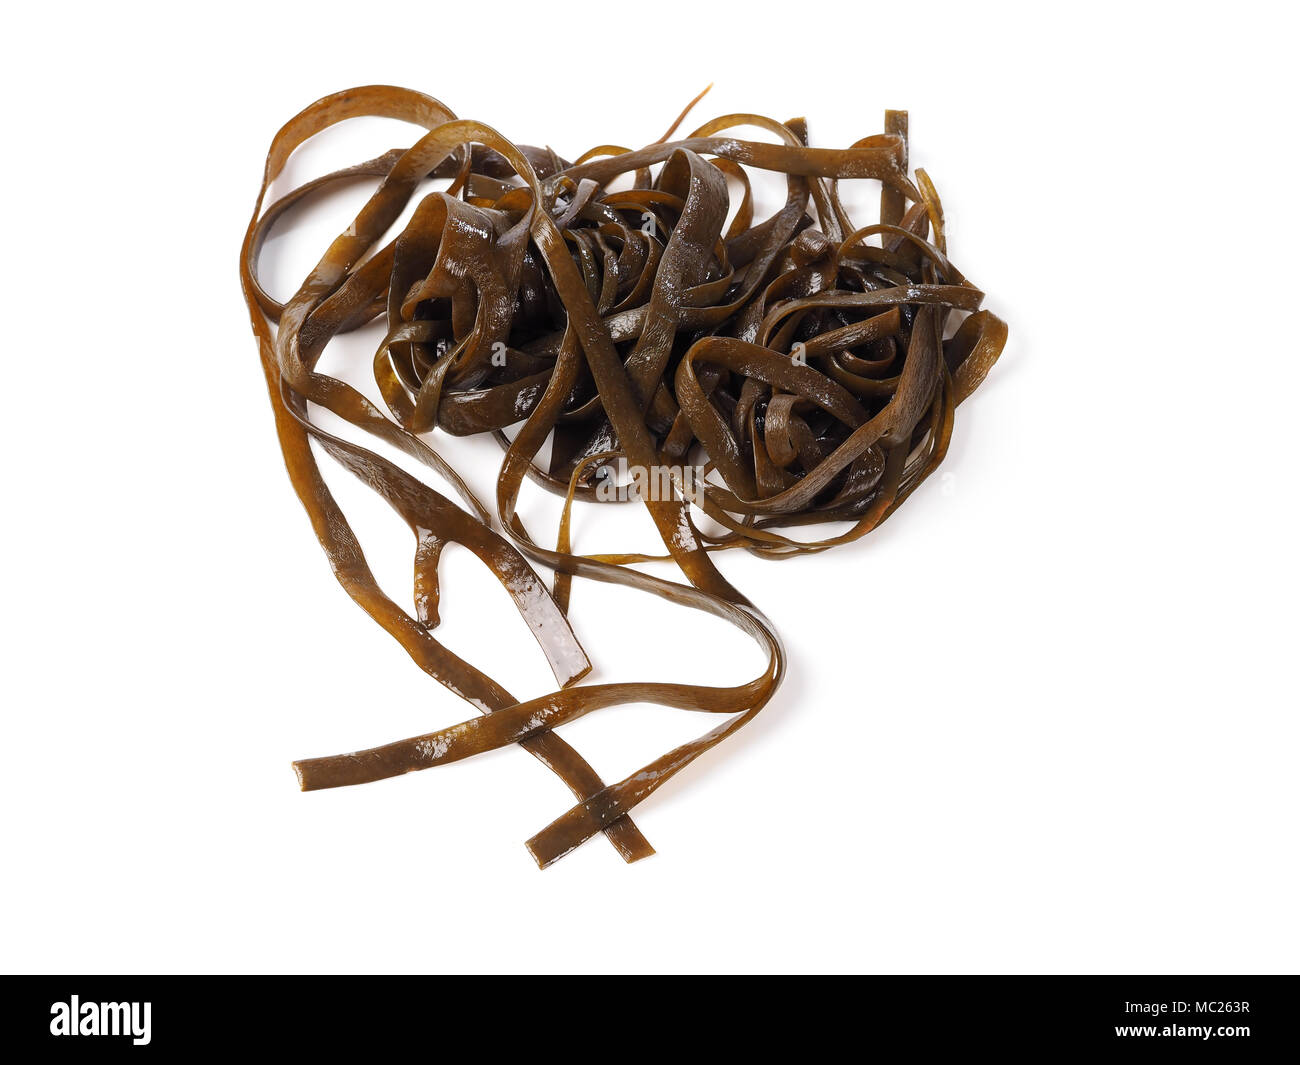 Thongweed – Sea thong – Sea spaghetti – Espagheti de mar  Sea spaghetti is a brown algae. Binomial name: Himanthalia elongata. It is an edible seaweed - Stock Image